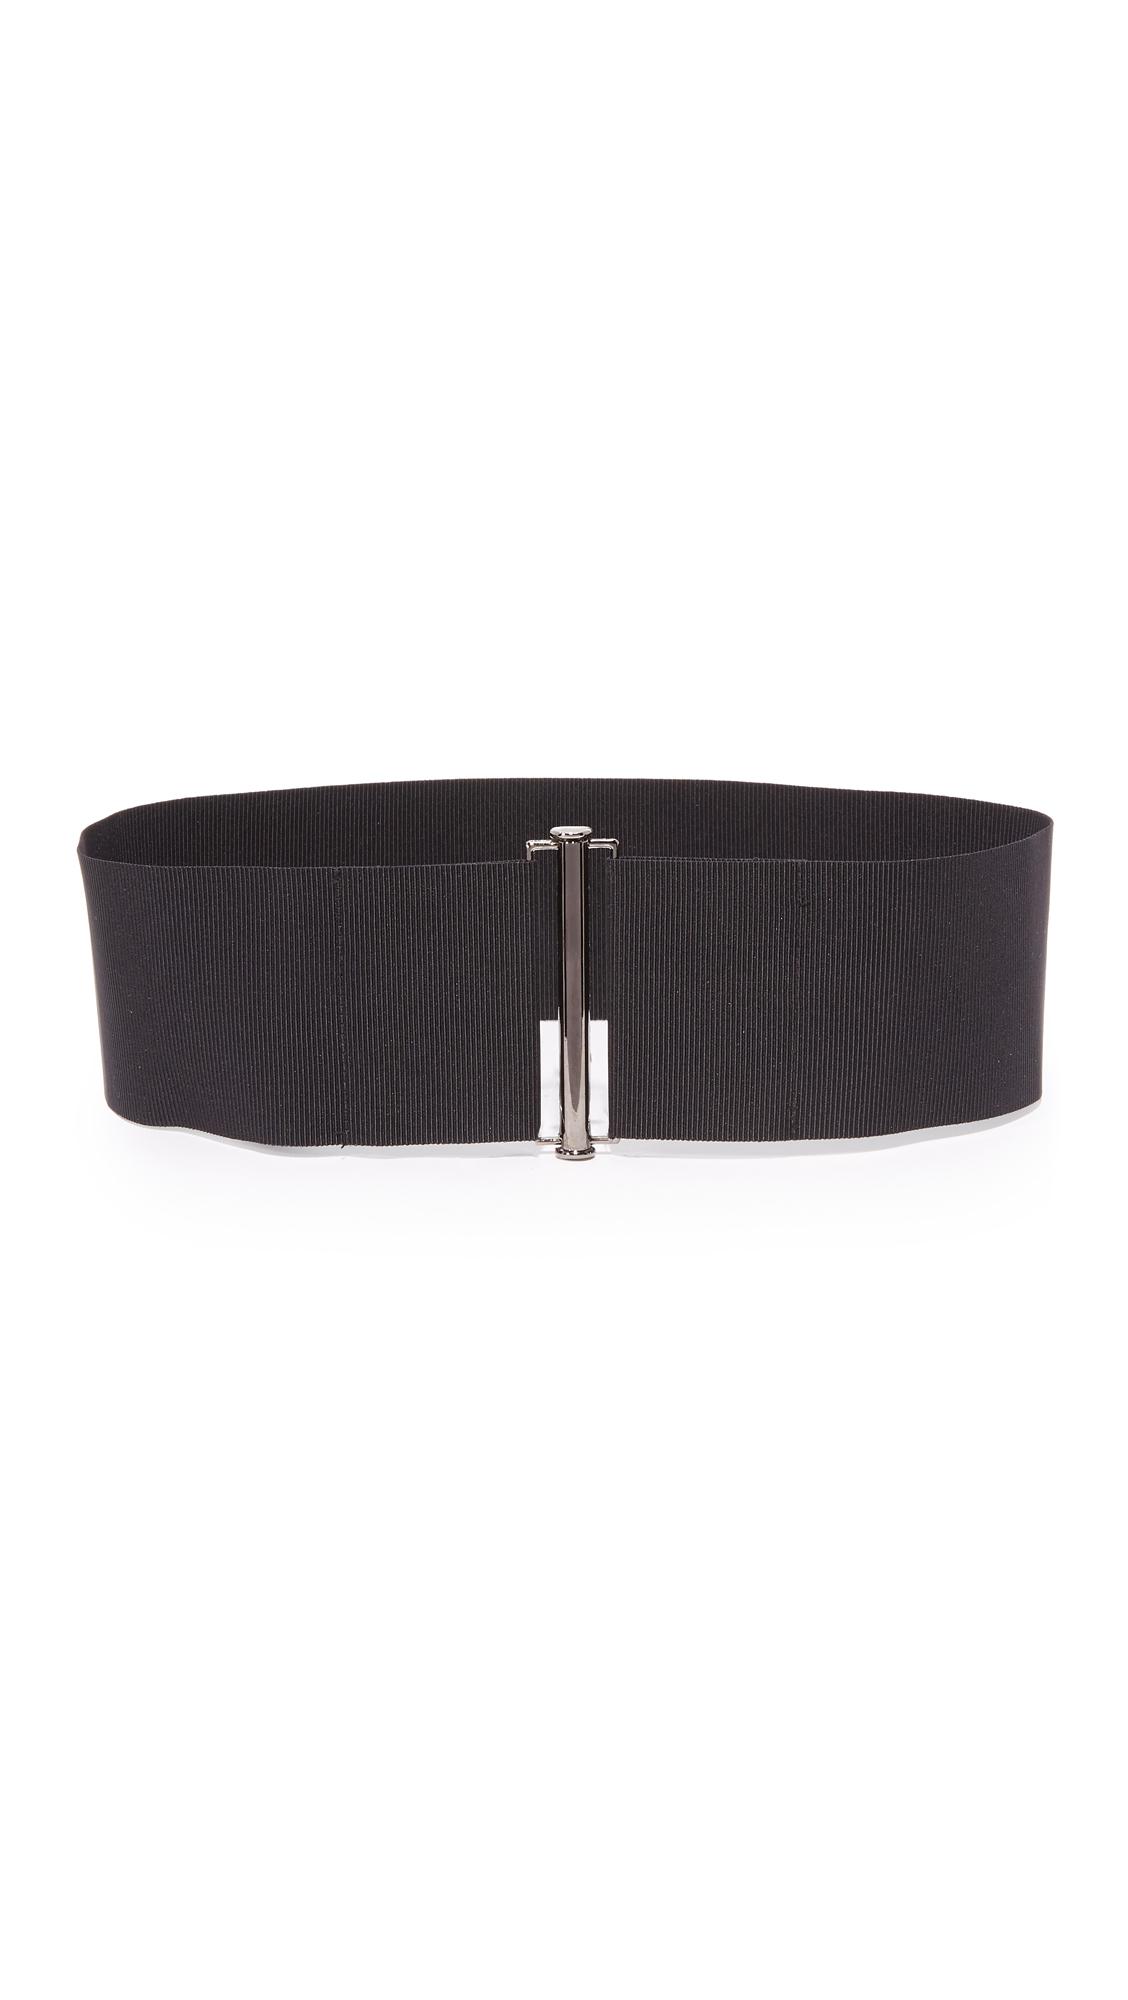 Zero + Maria Cornejo Zumi Belt - Black at Shopbop